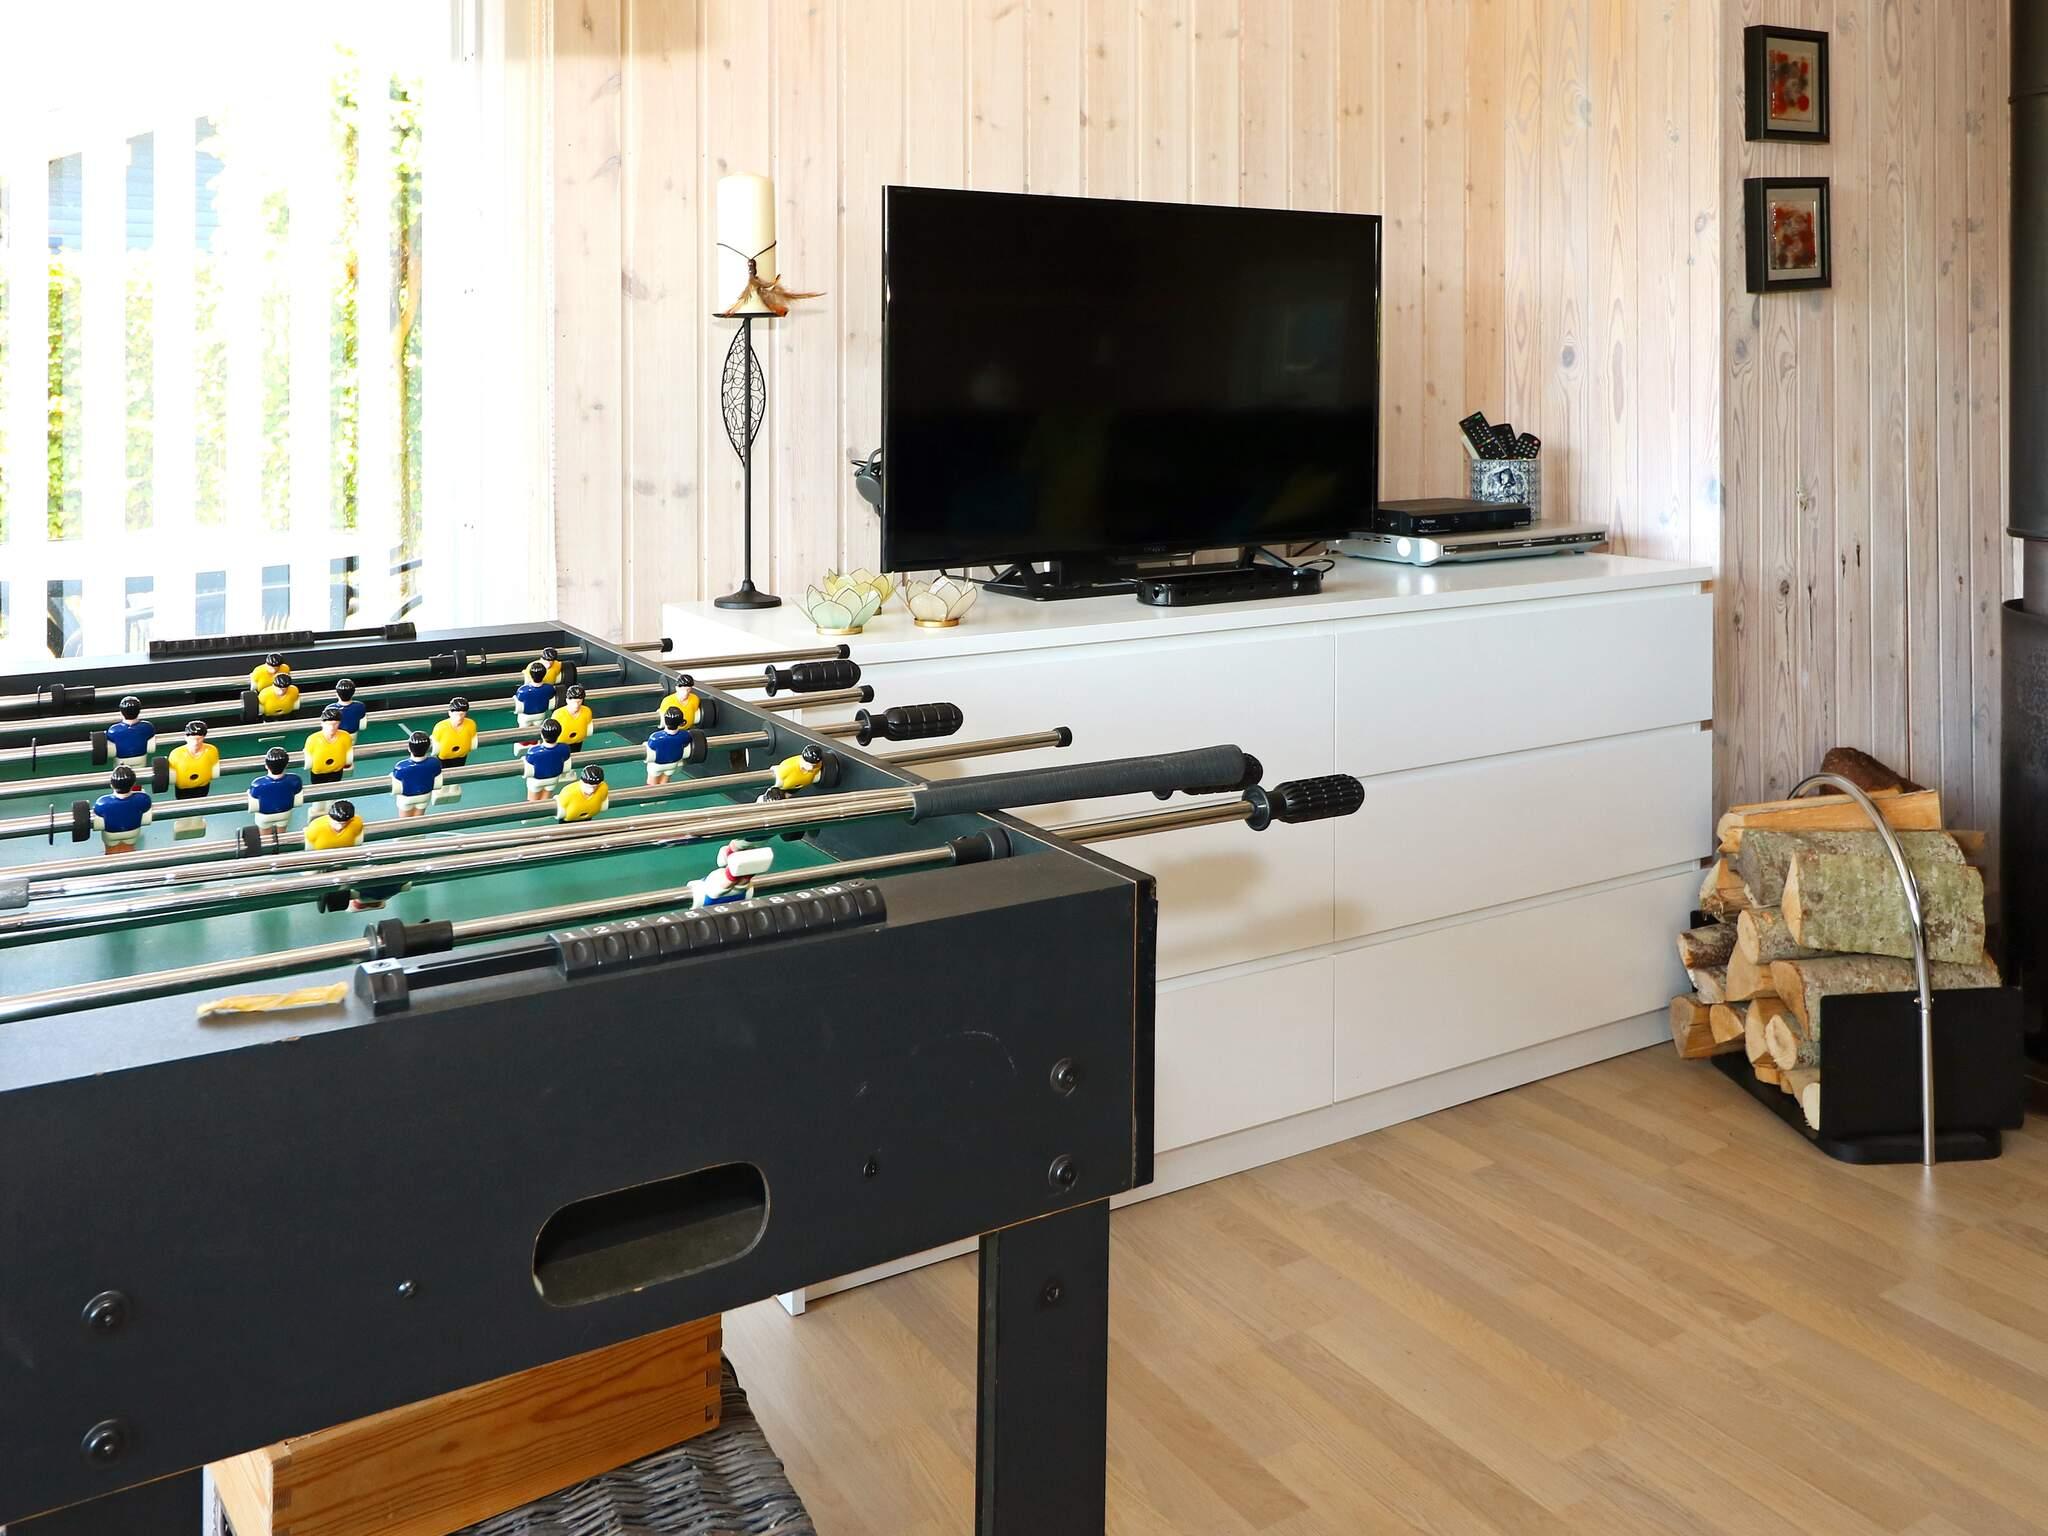 Ferienhaus Øster Hurup (356533), Øster Hurup, , Dänische Ostsee, Dänemark, Bild 7